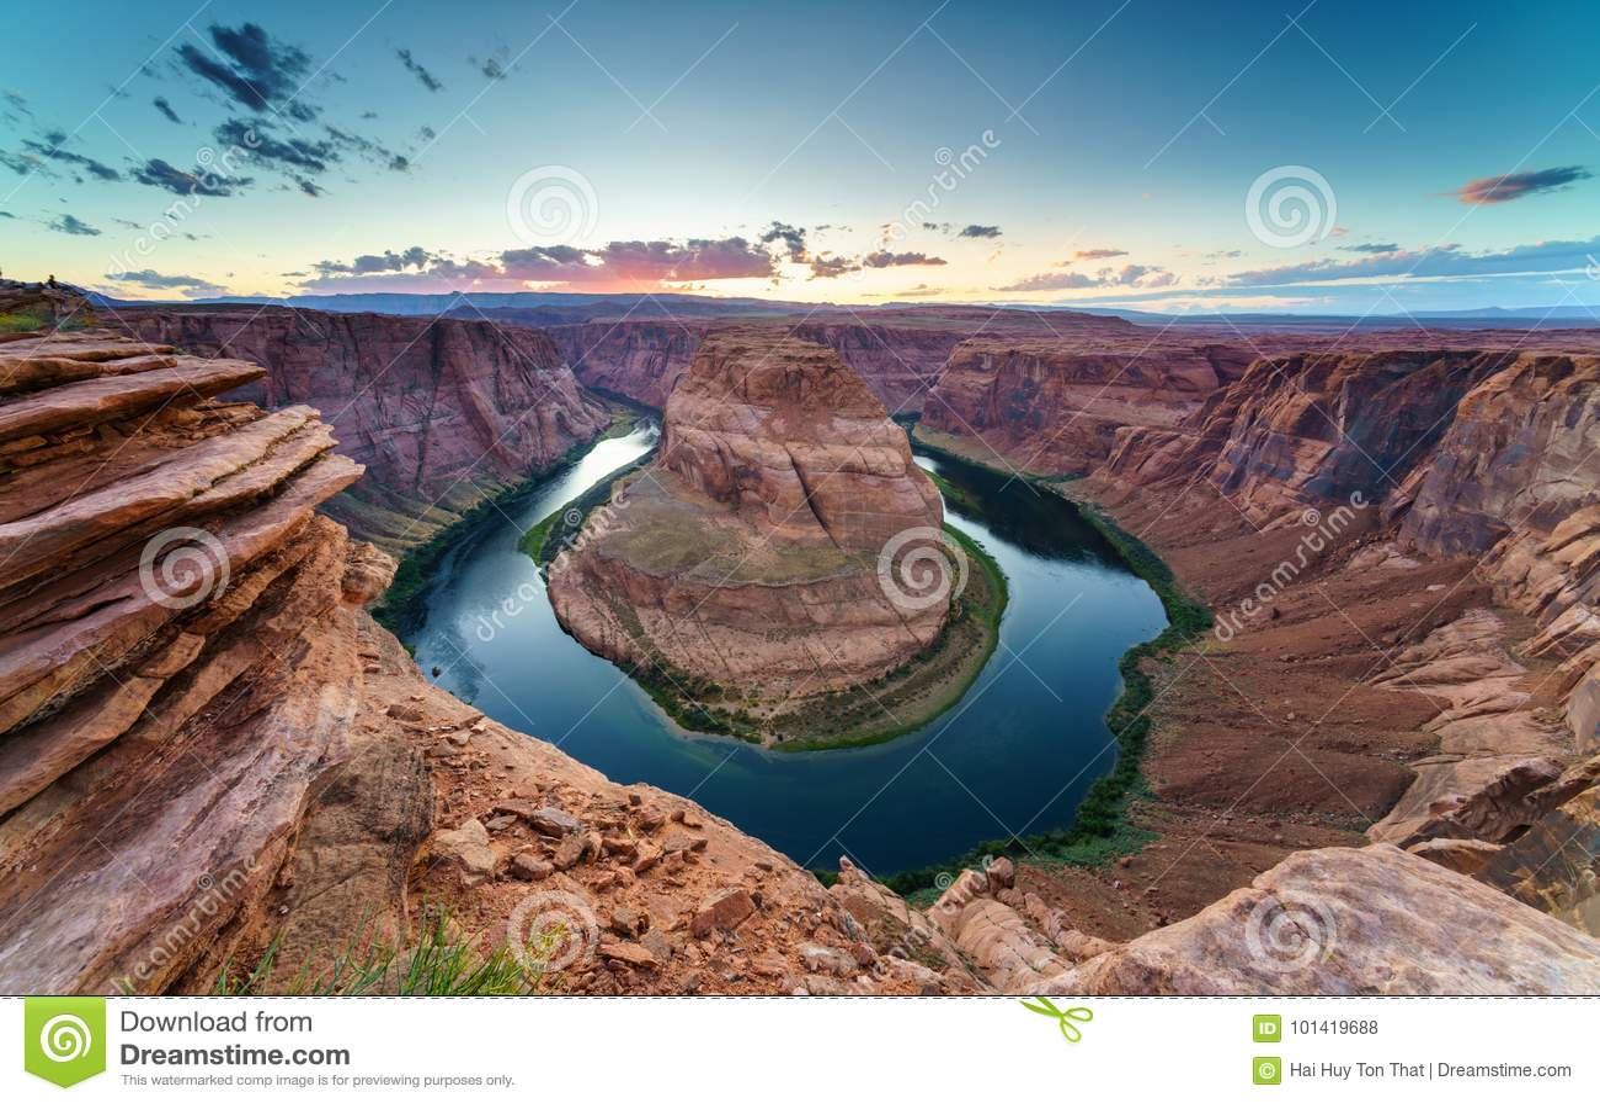 Courbure de chaussure de cheval, le fleuve Colorado en page, Arizona Etats-Unis